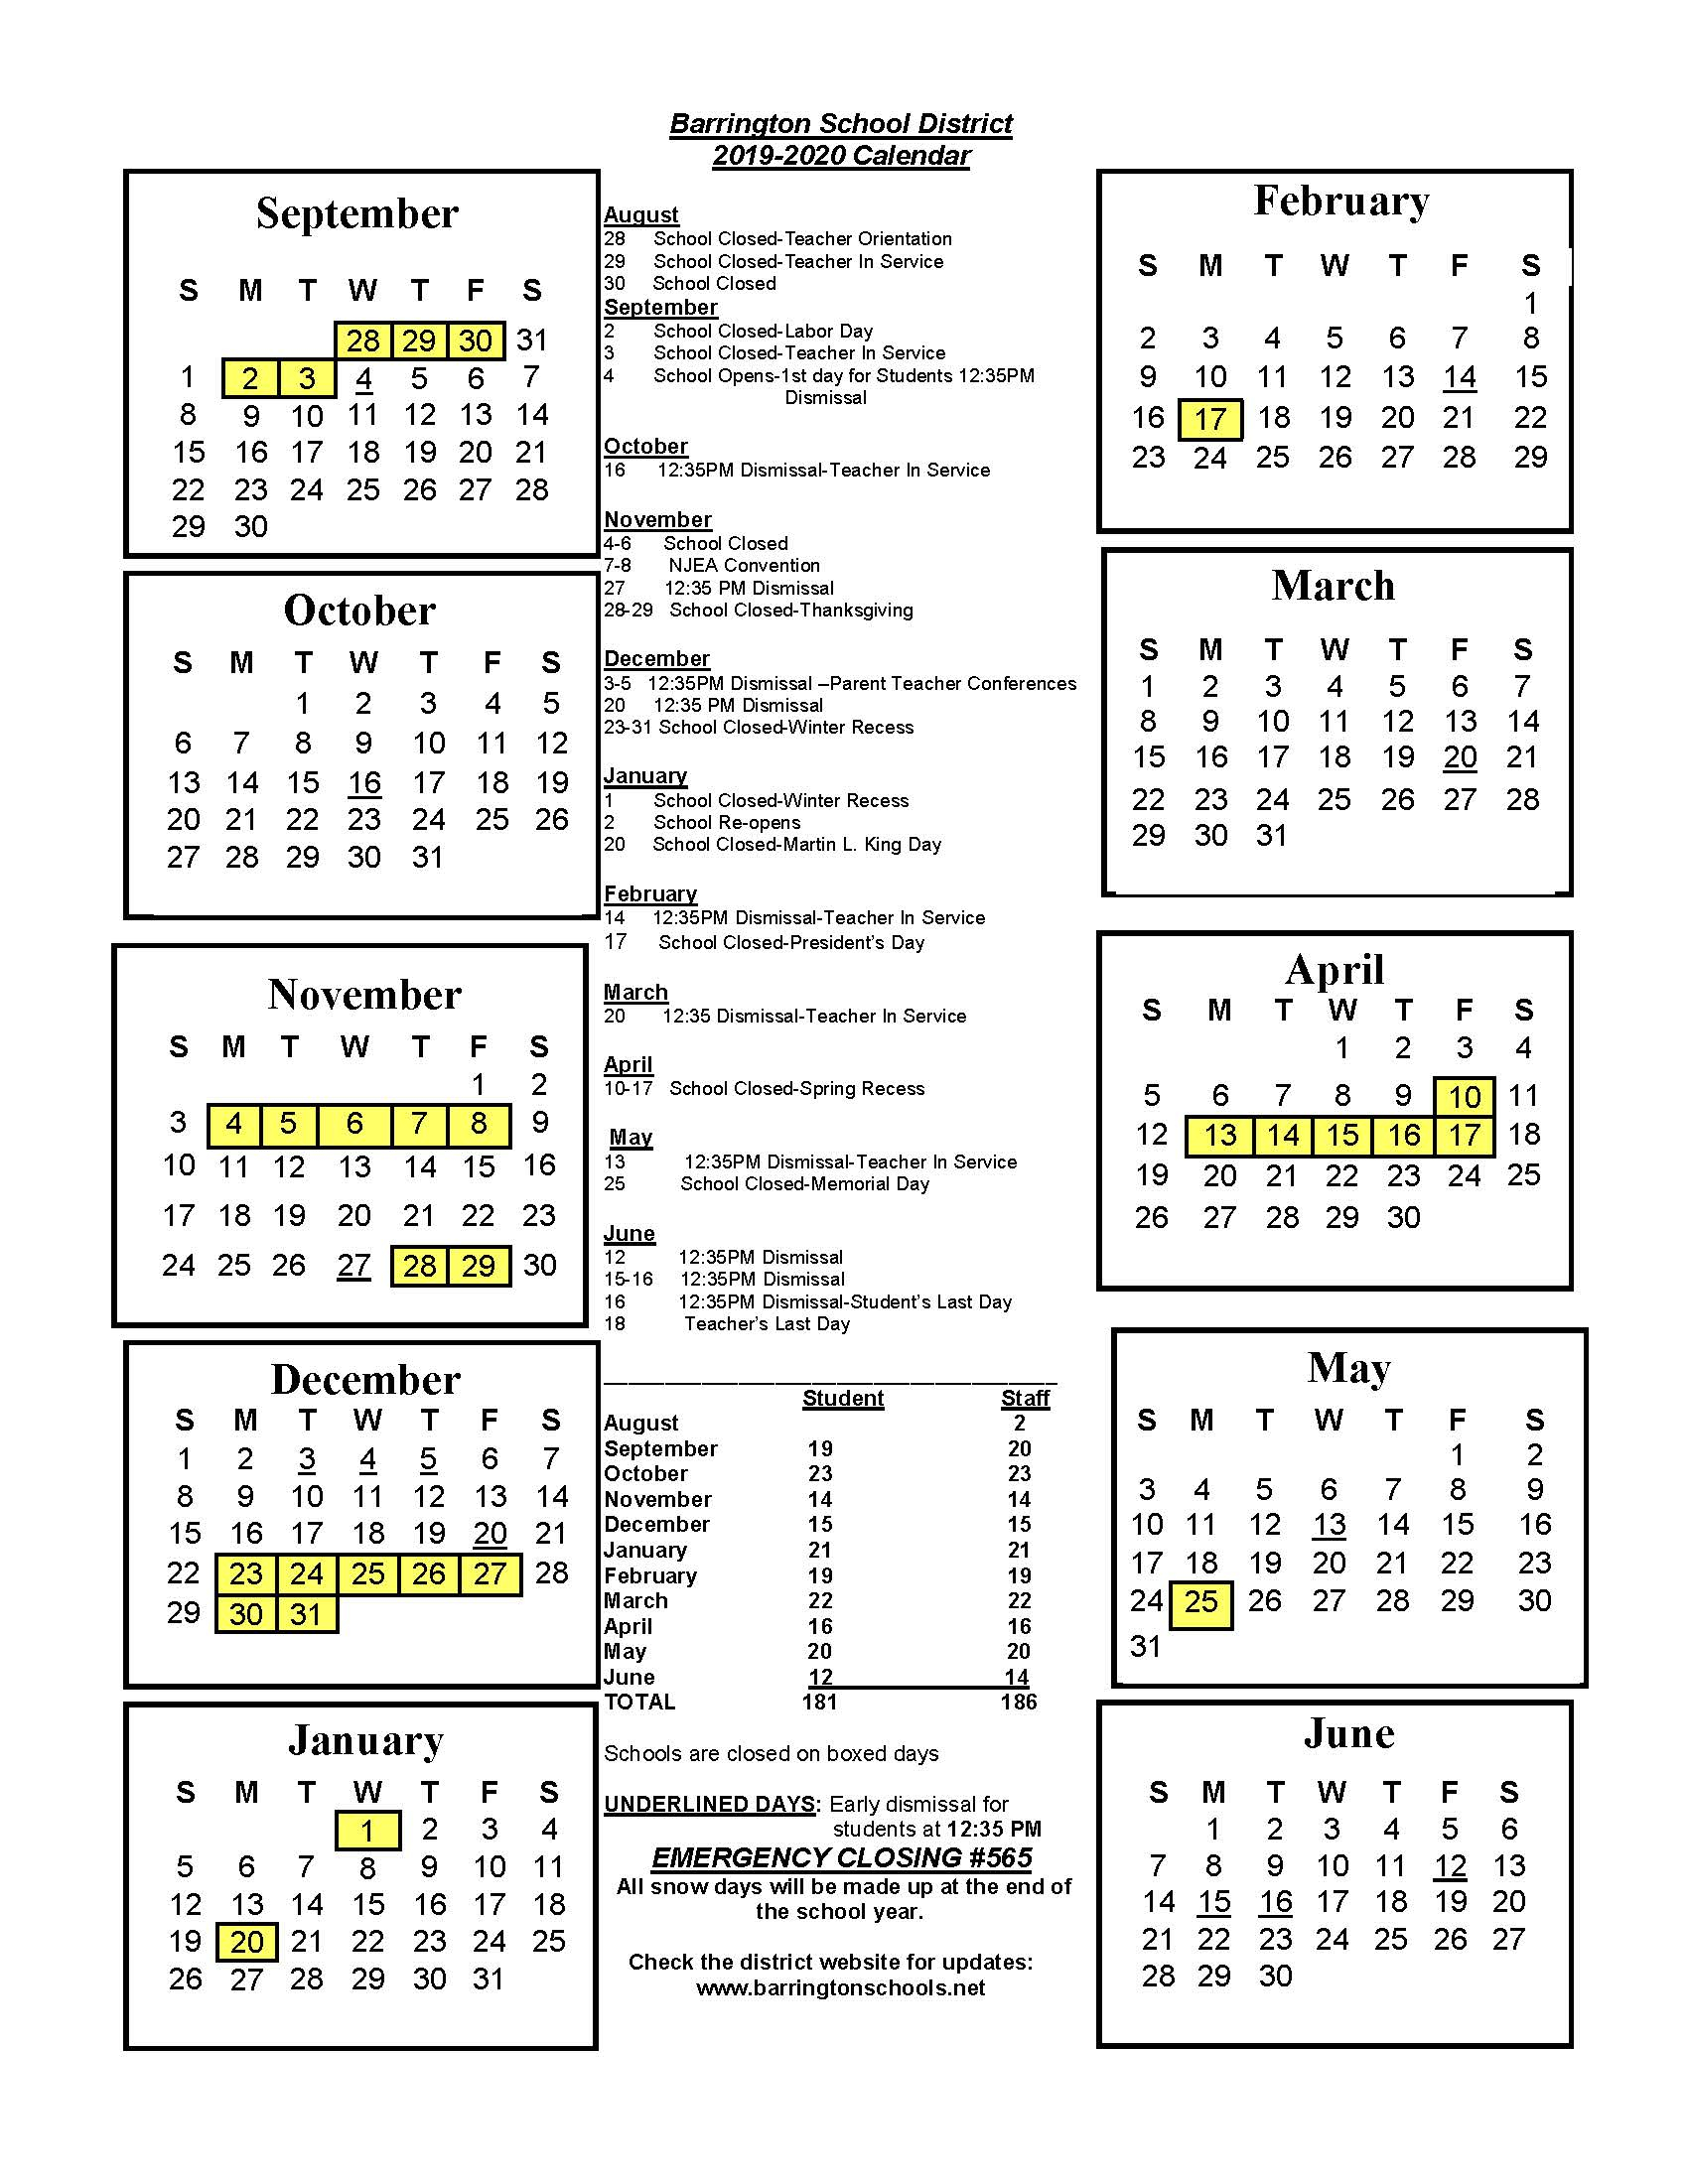 District Calendar - Barrington School District Pertaining To Bethlehem Area School District Calendar 2021